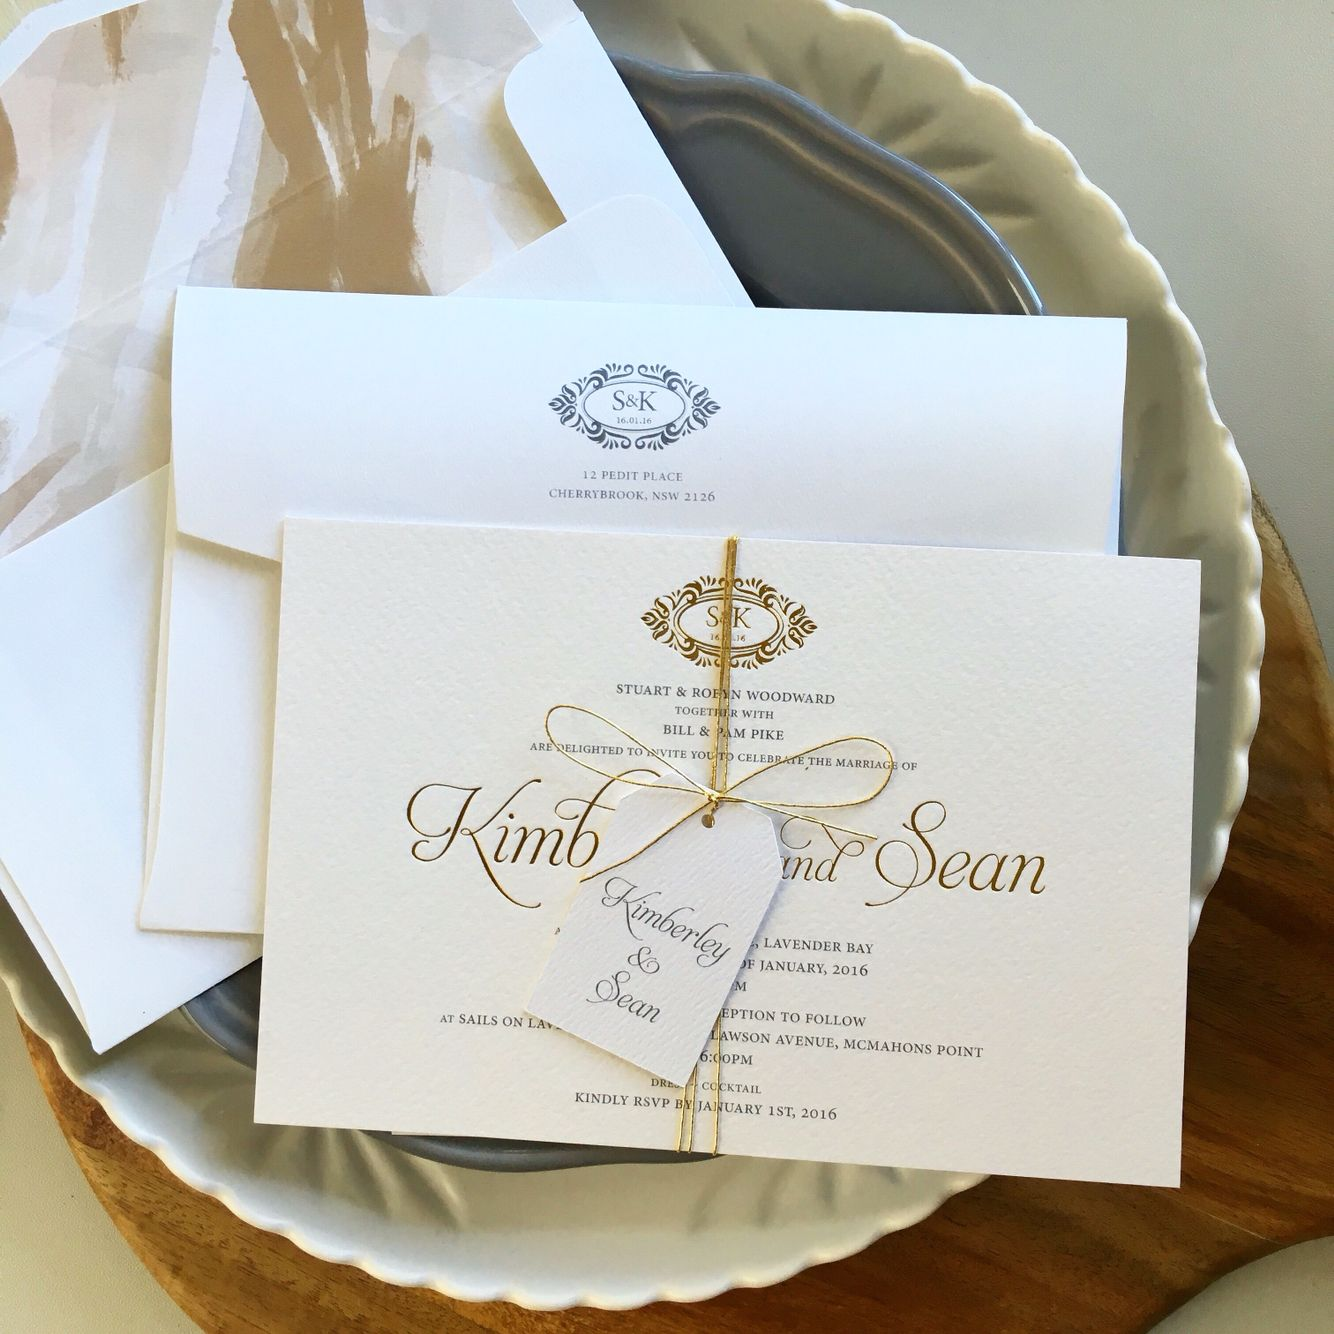 Gold Foil Grey Print Wedding Invitations Featuring Swirled Gold